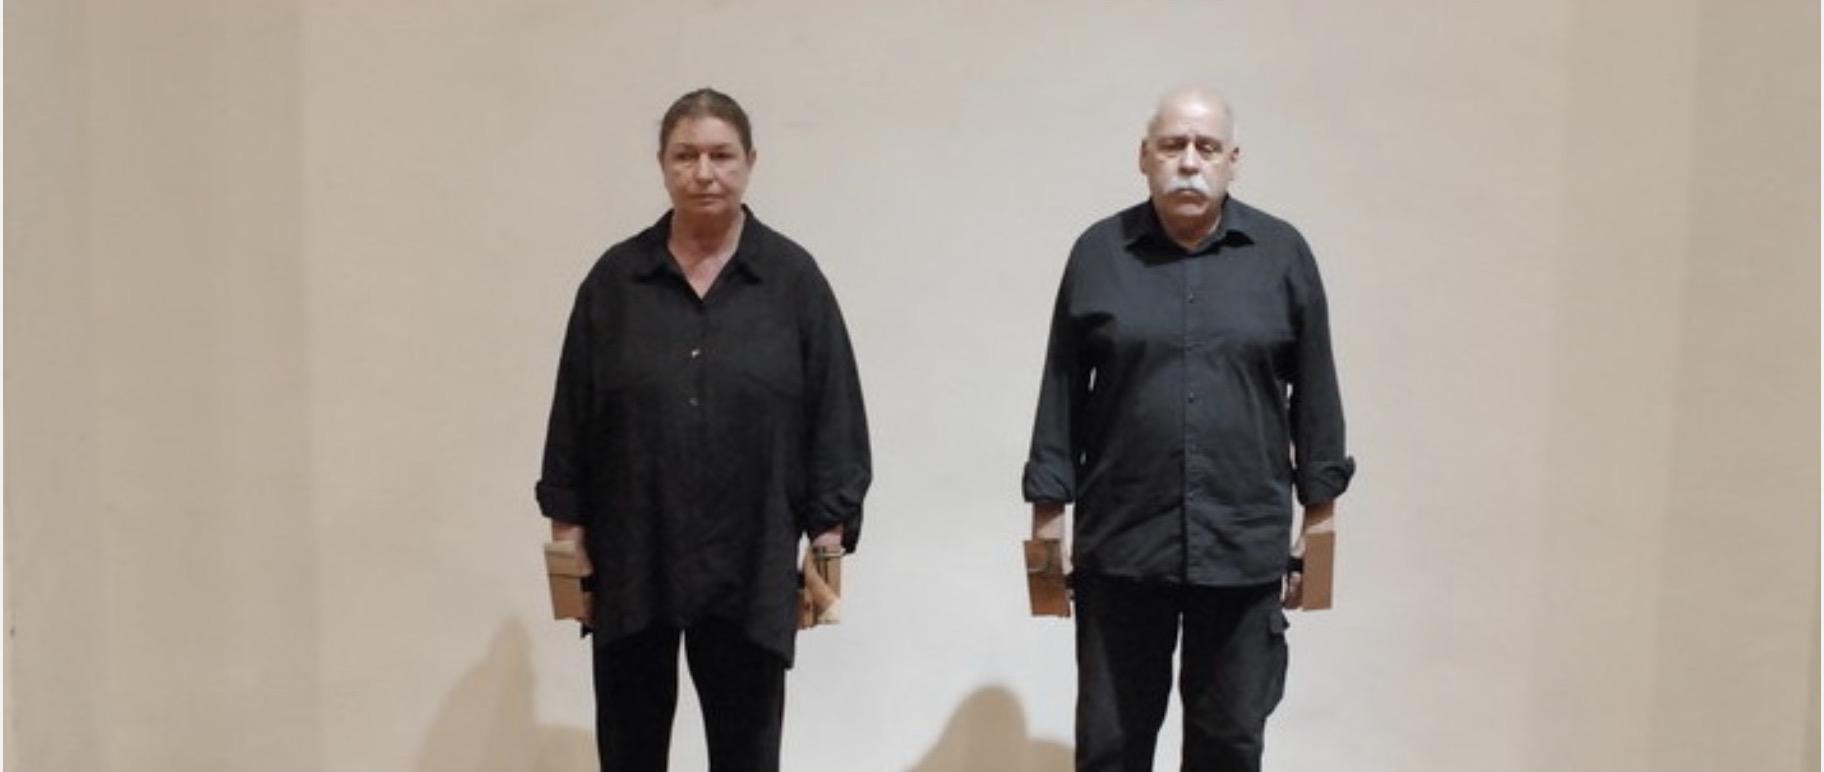 performance art archive パフォーマンス アート アーカイブ 映像